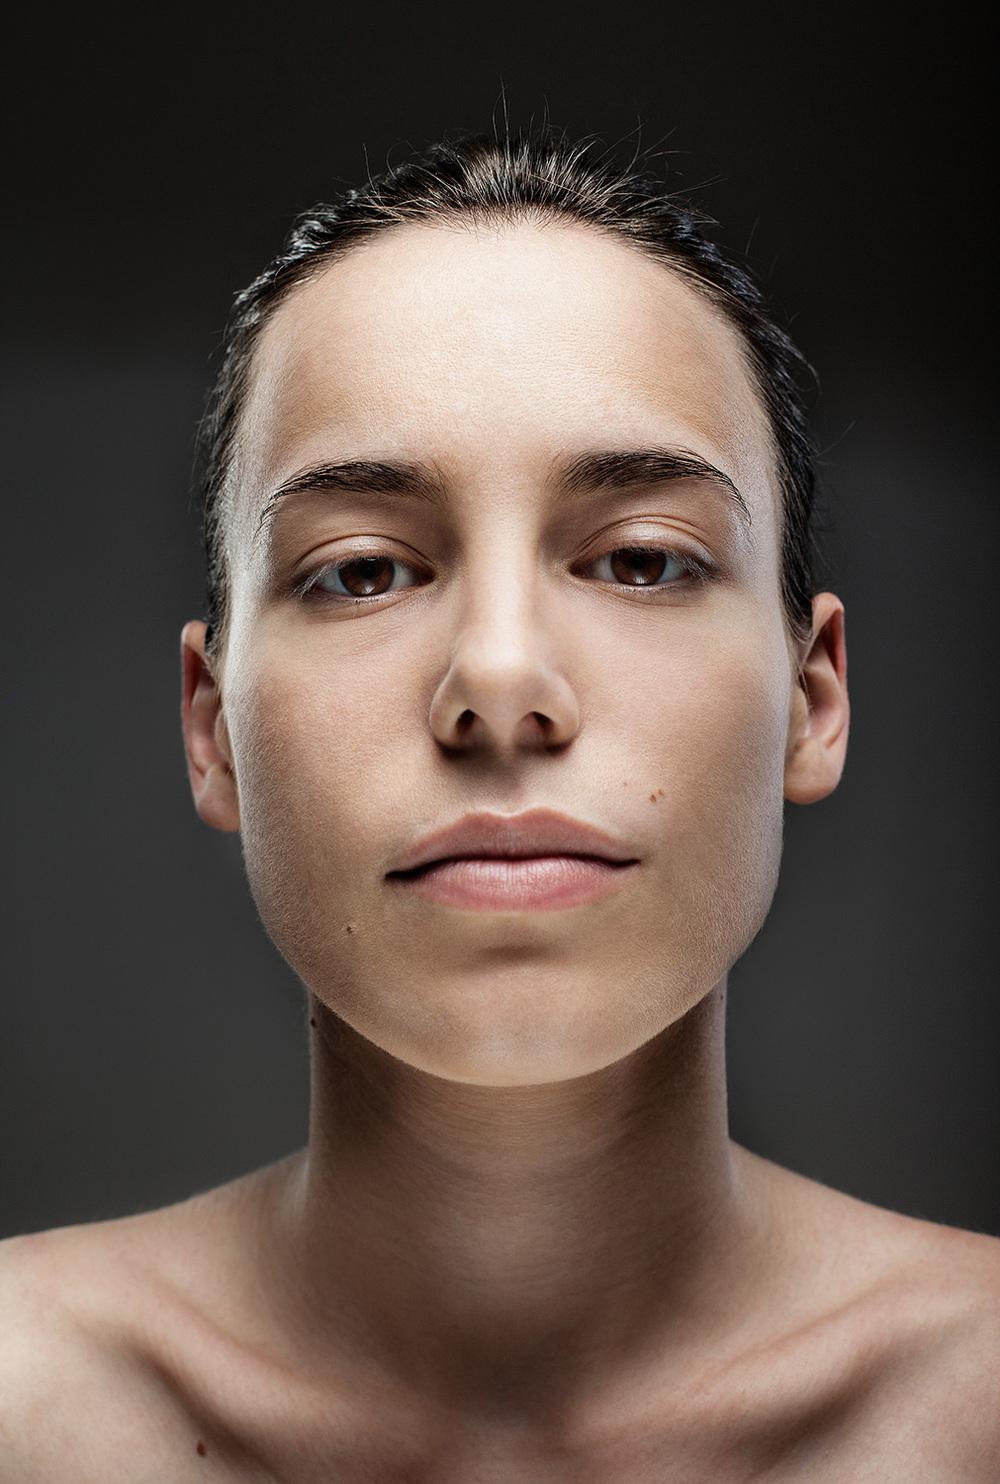 Jelena-Lucic-portrait.jpg